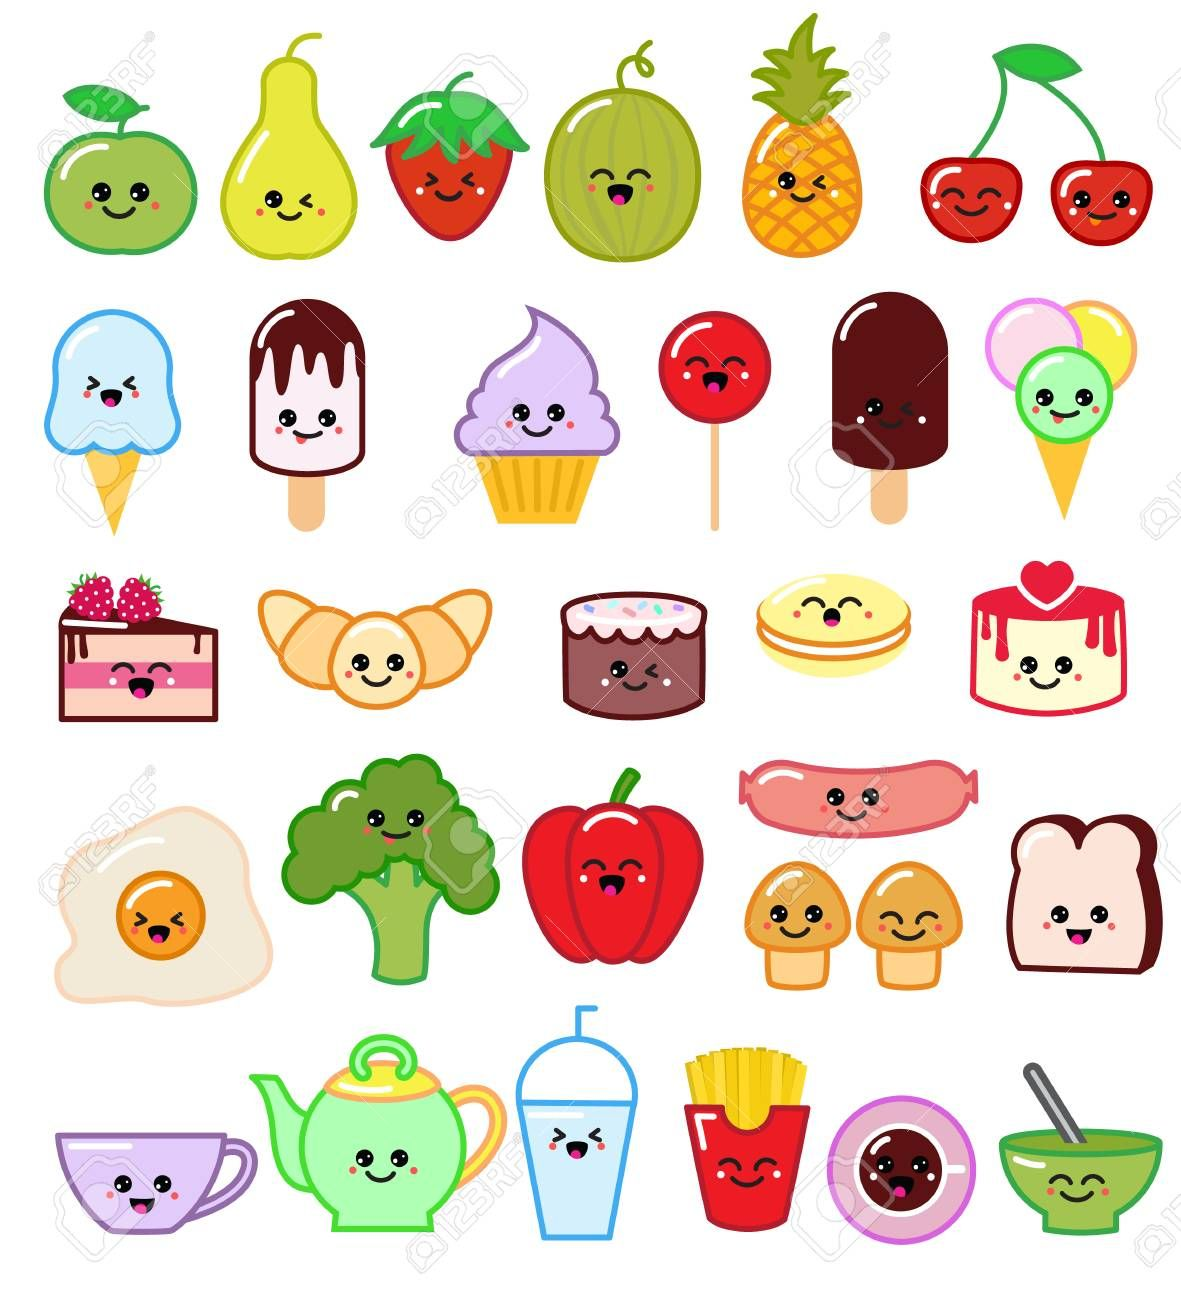 Kawaii Food Vector Emoticon Japanese Fruit Or Vegetable Character And Emoji Dish With Cartoon Sausage In Japan Re In 2020 Cute Food Drawings Kawaii Food Kawaii Doodles